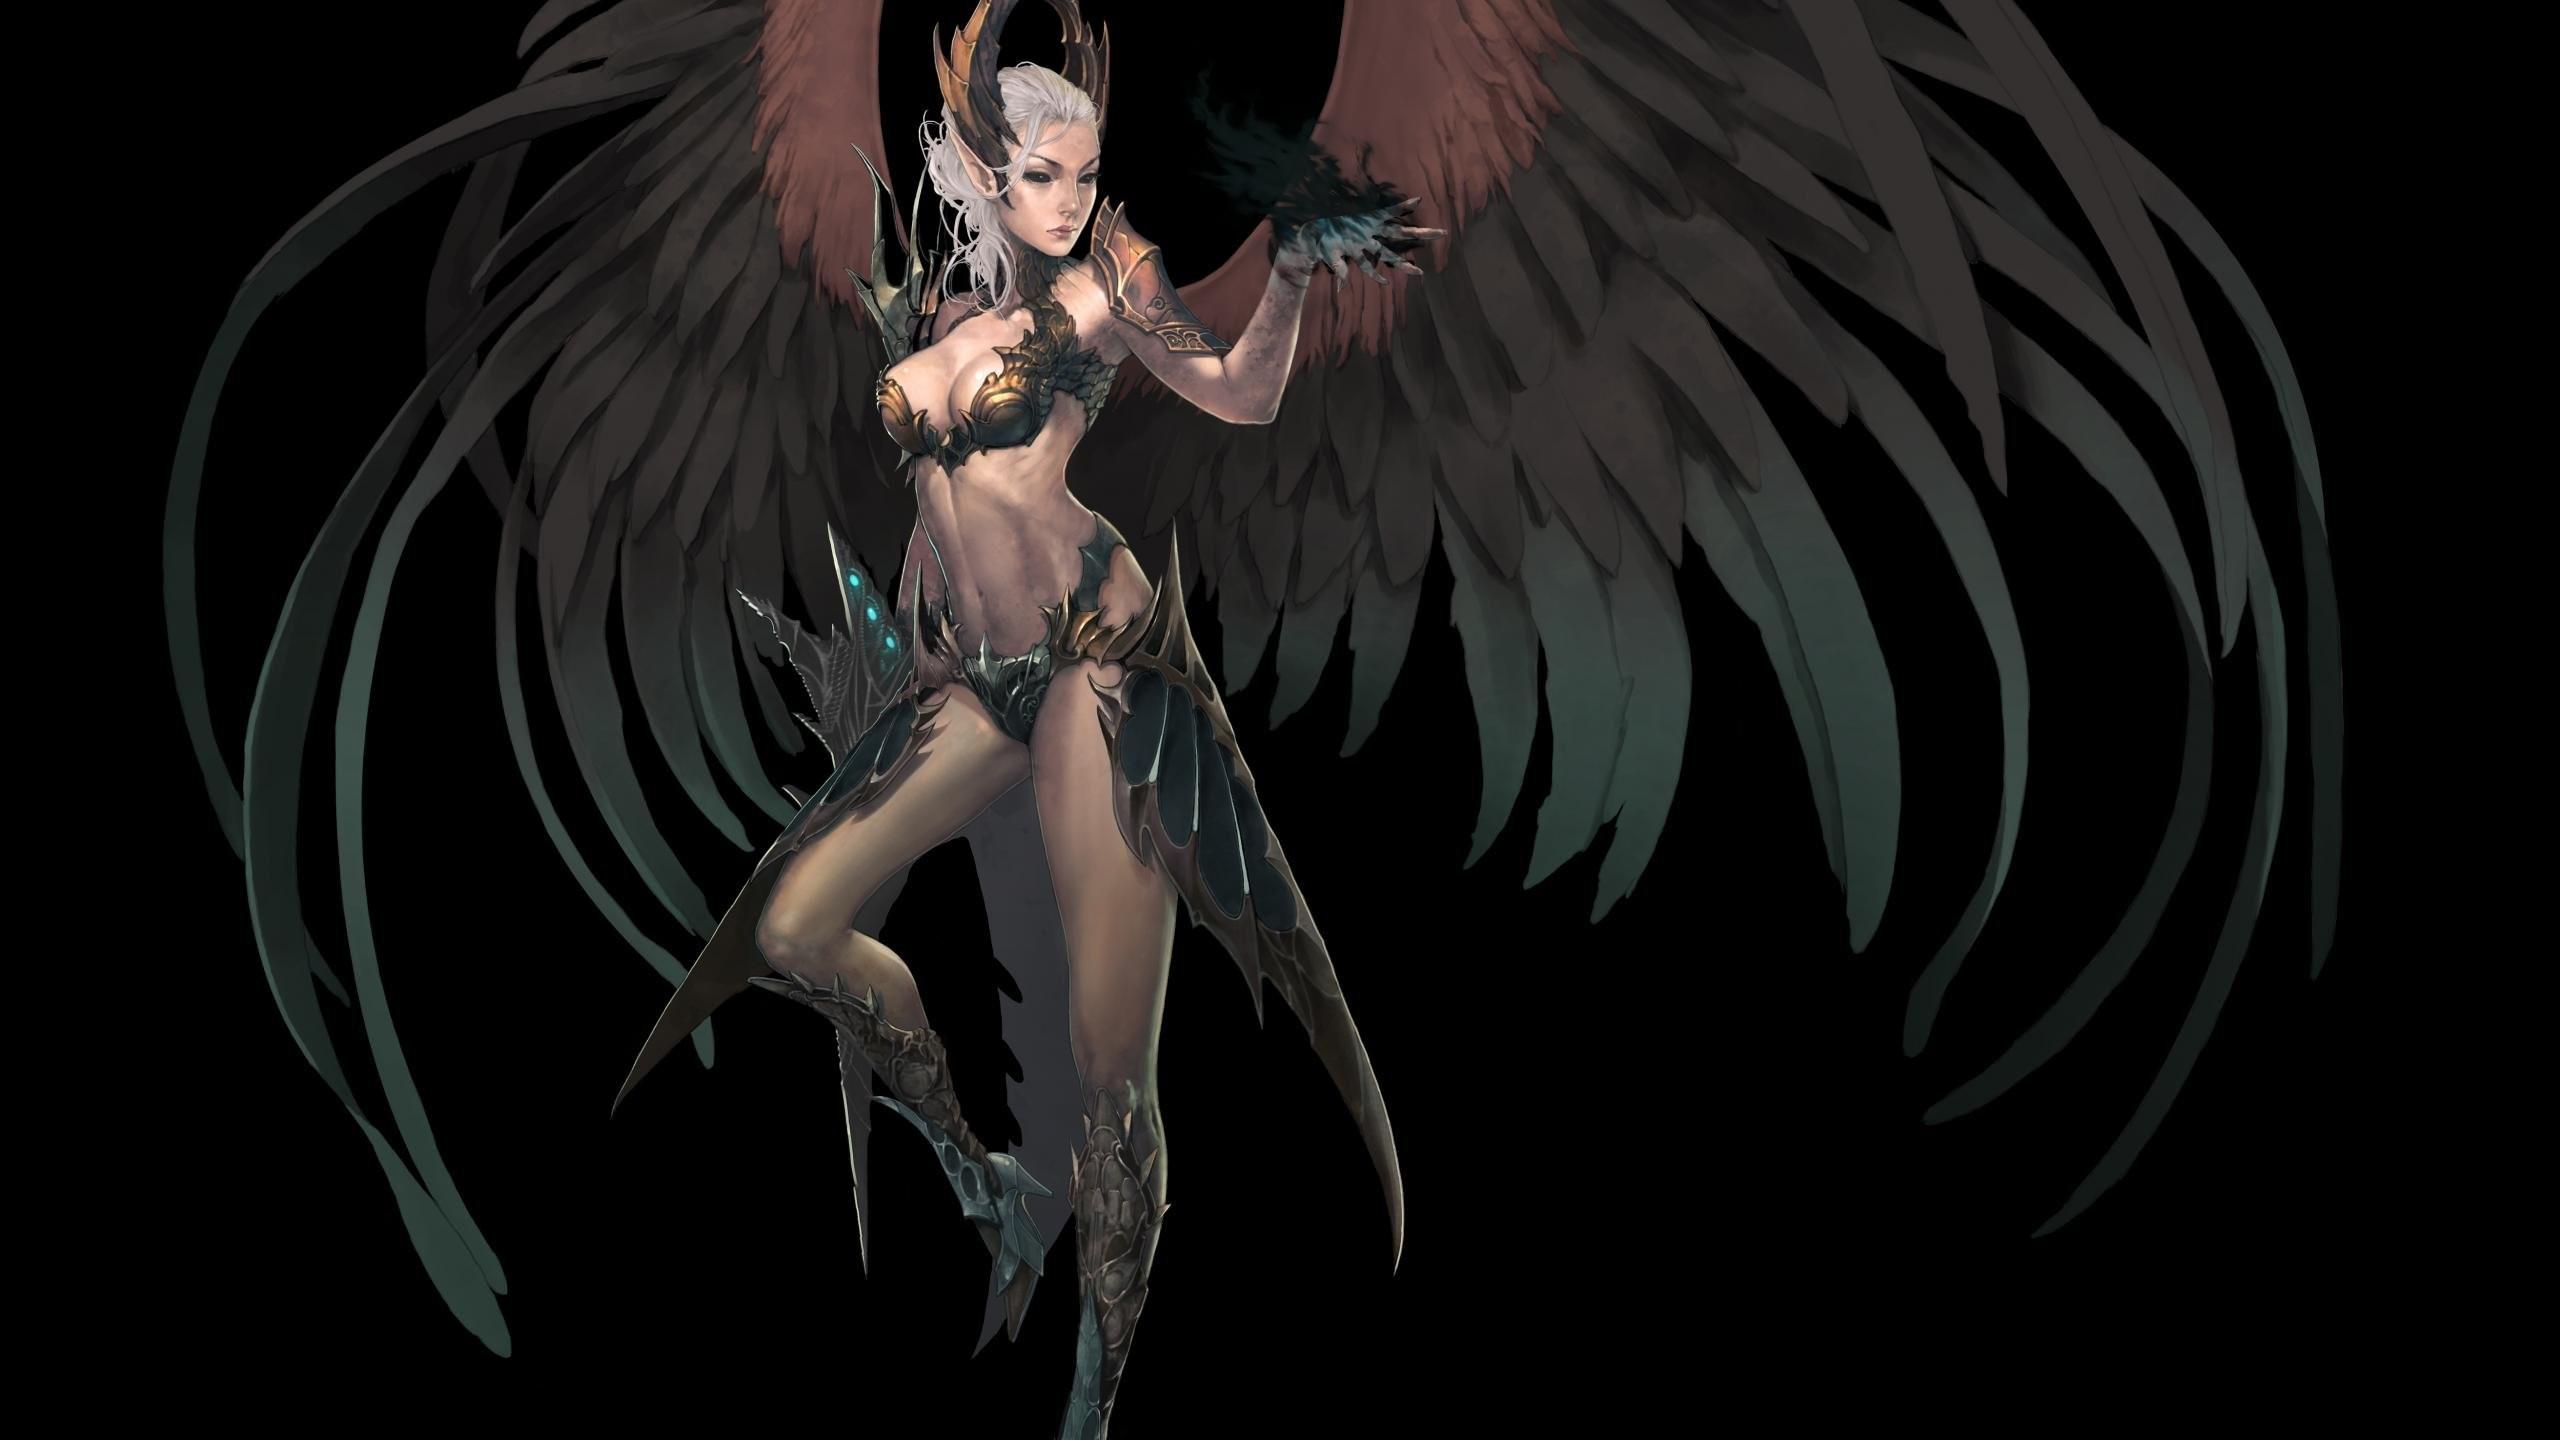 Dark Fantasy Angel Fallen Demon Original Wallpaper At Dark Wallpapers